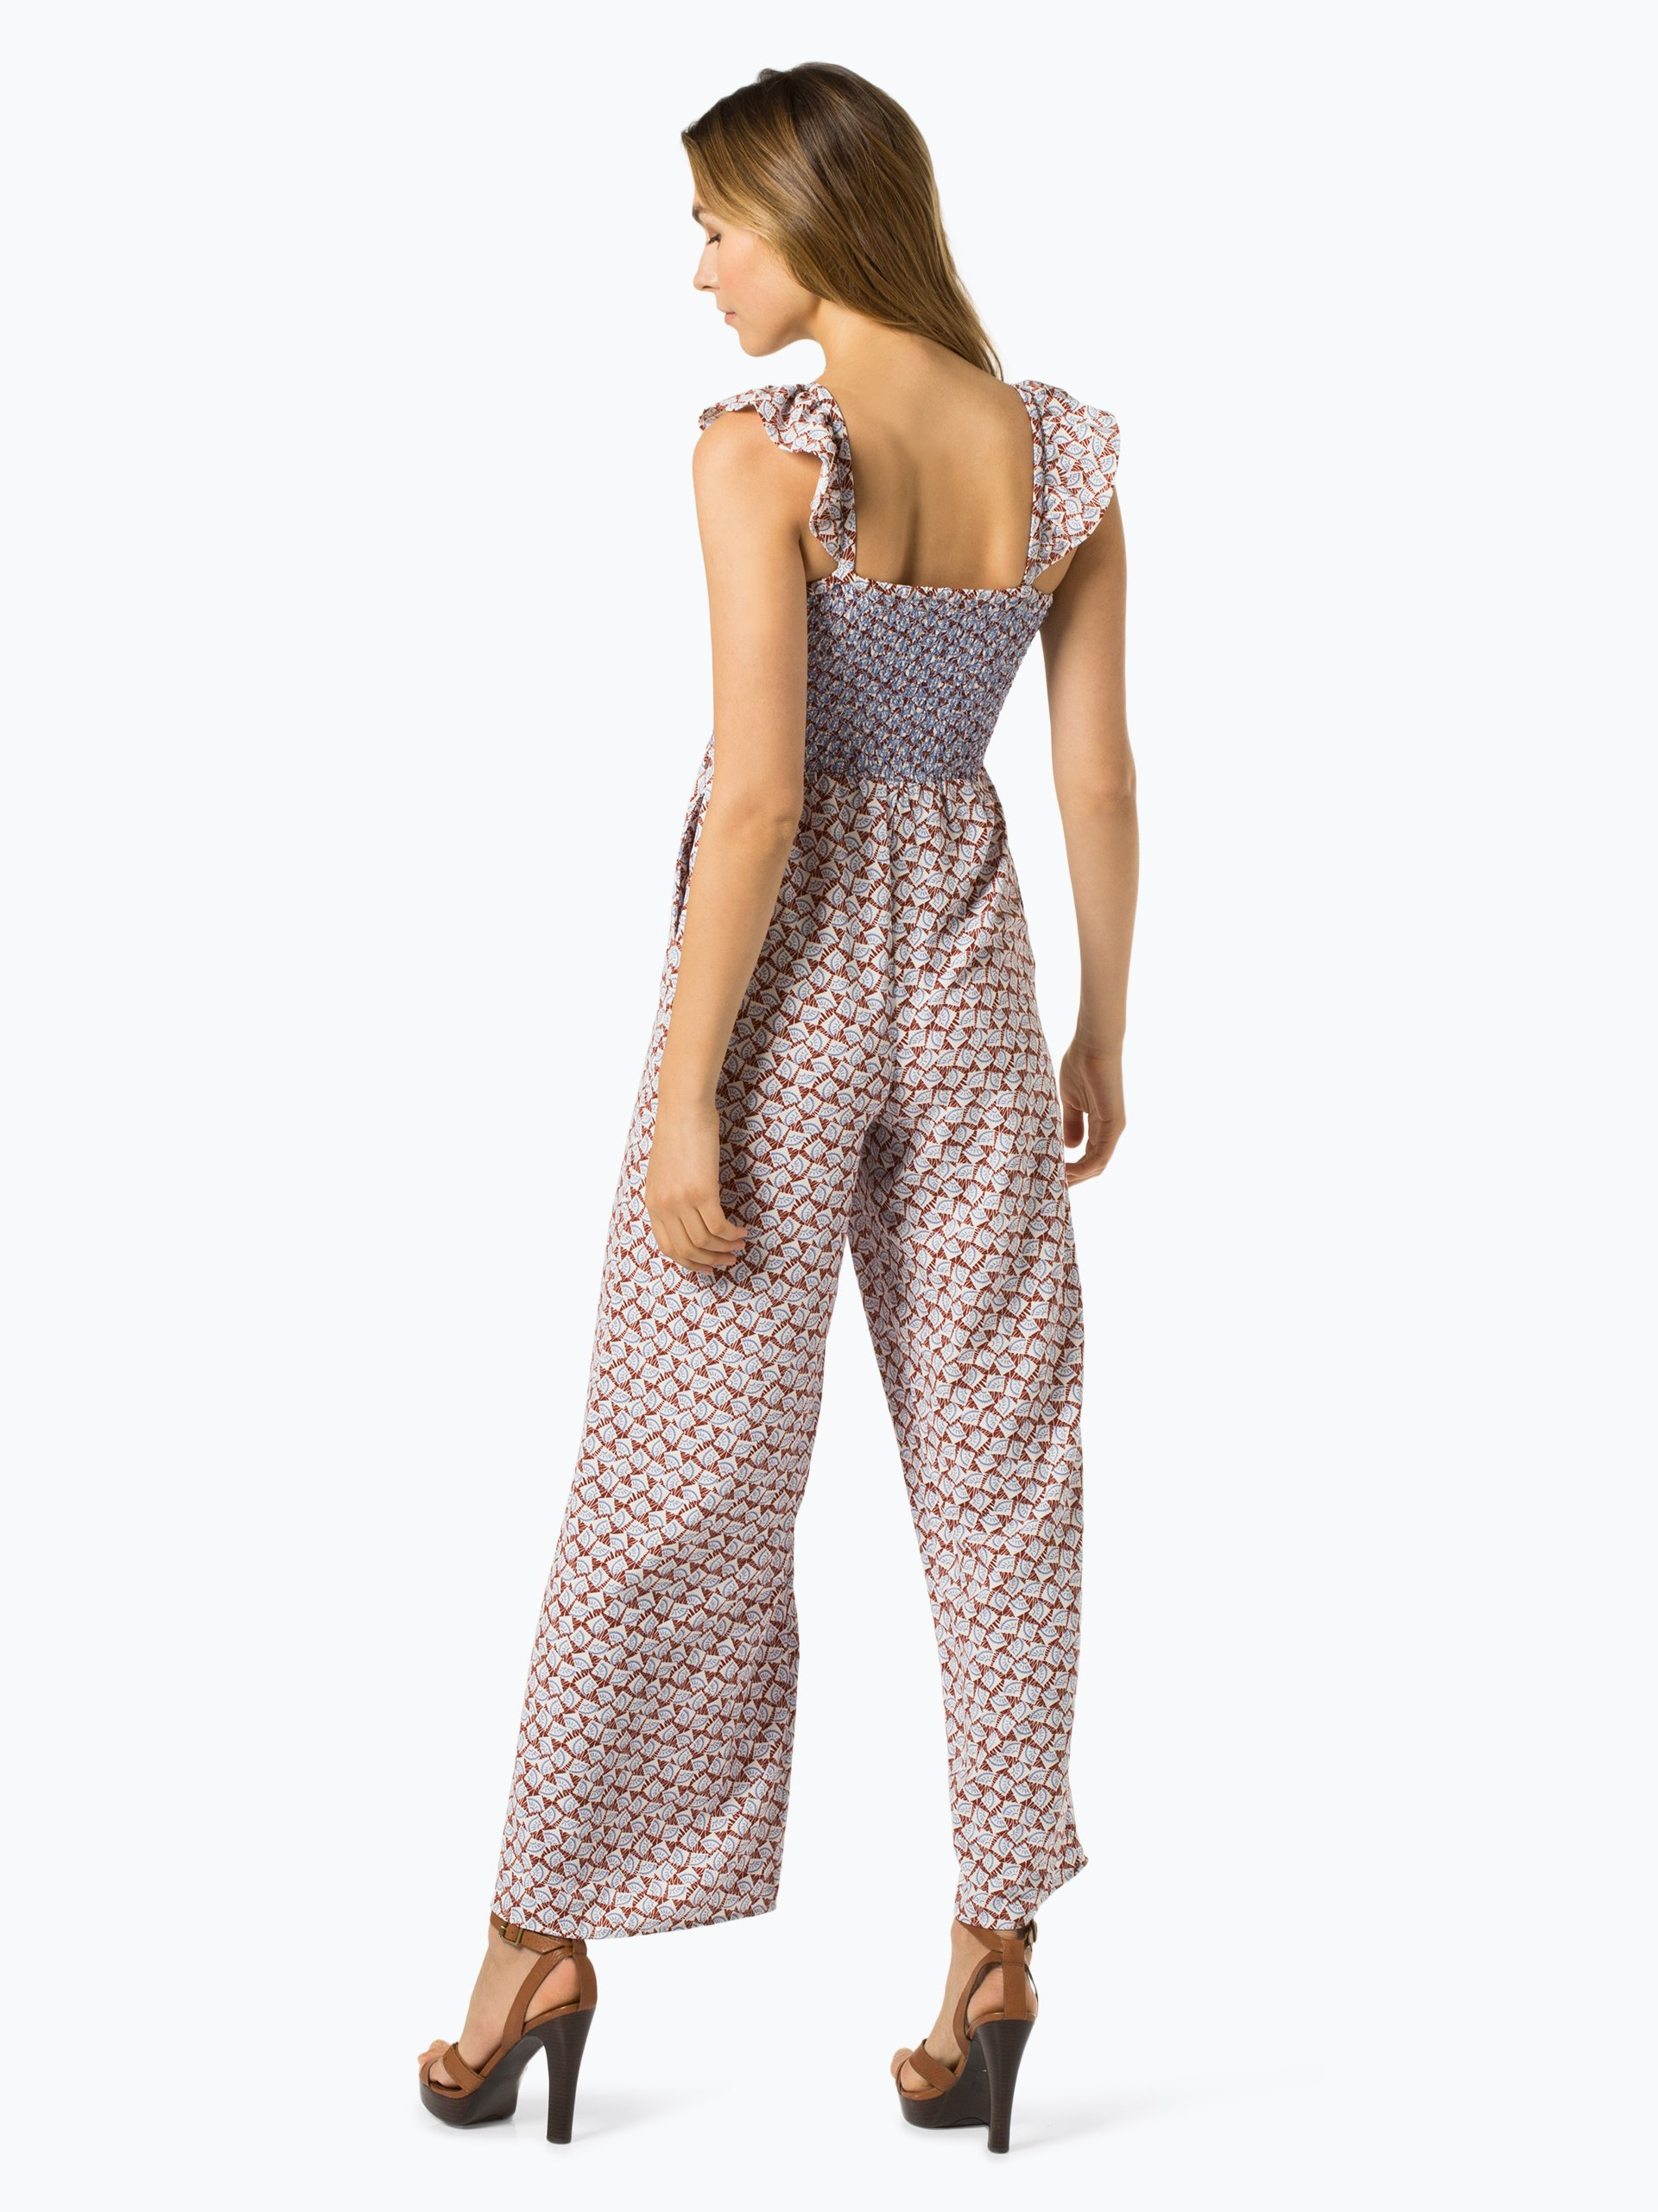 Pepe Jeans Damen Jumpsuit - Agata